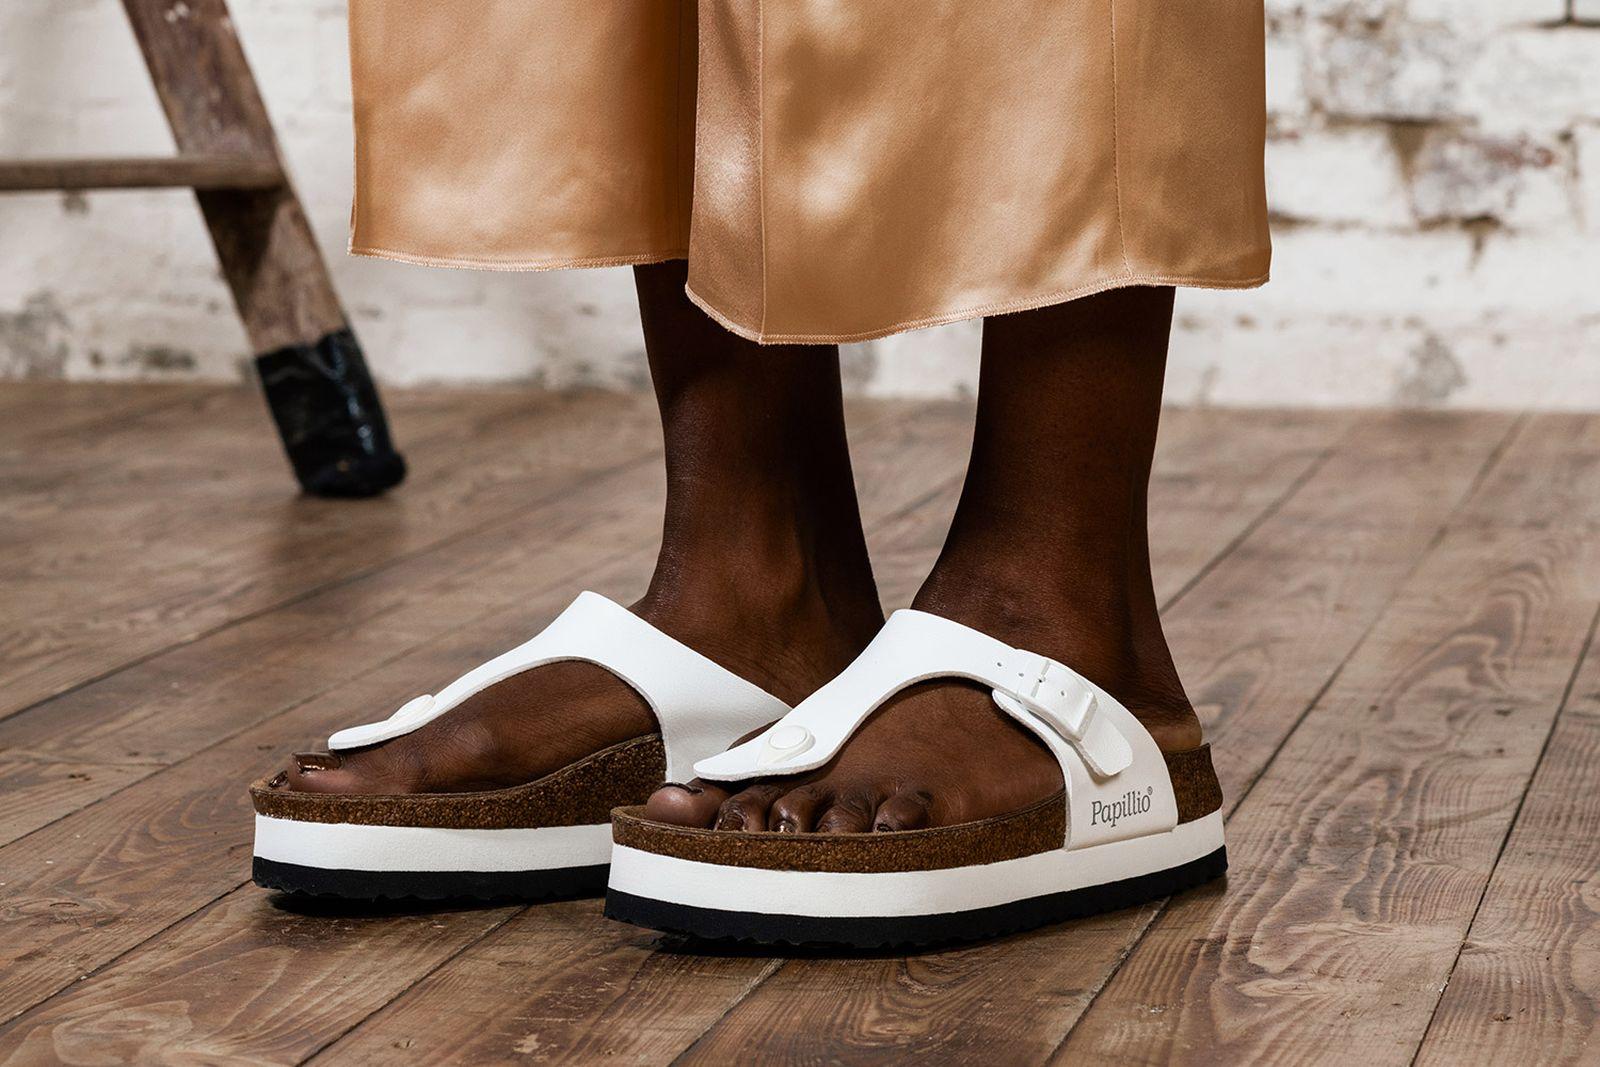 birkenstock-sandals-history-design-fashion-04